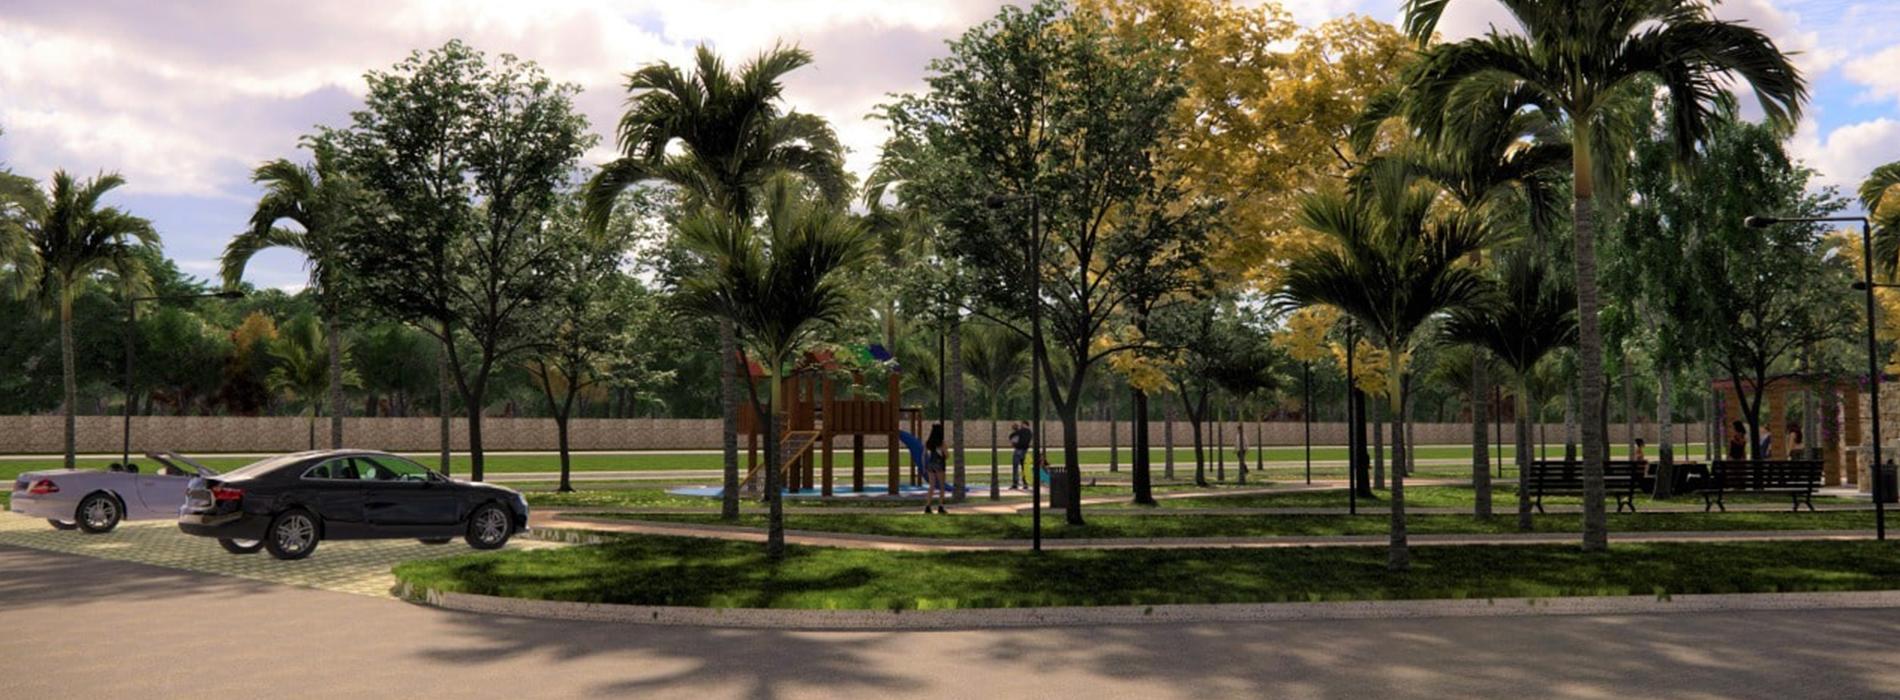 Terrenos Residenciales Venta Mérida Privada Inara Lotes Goodlers